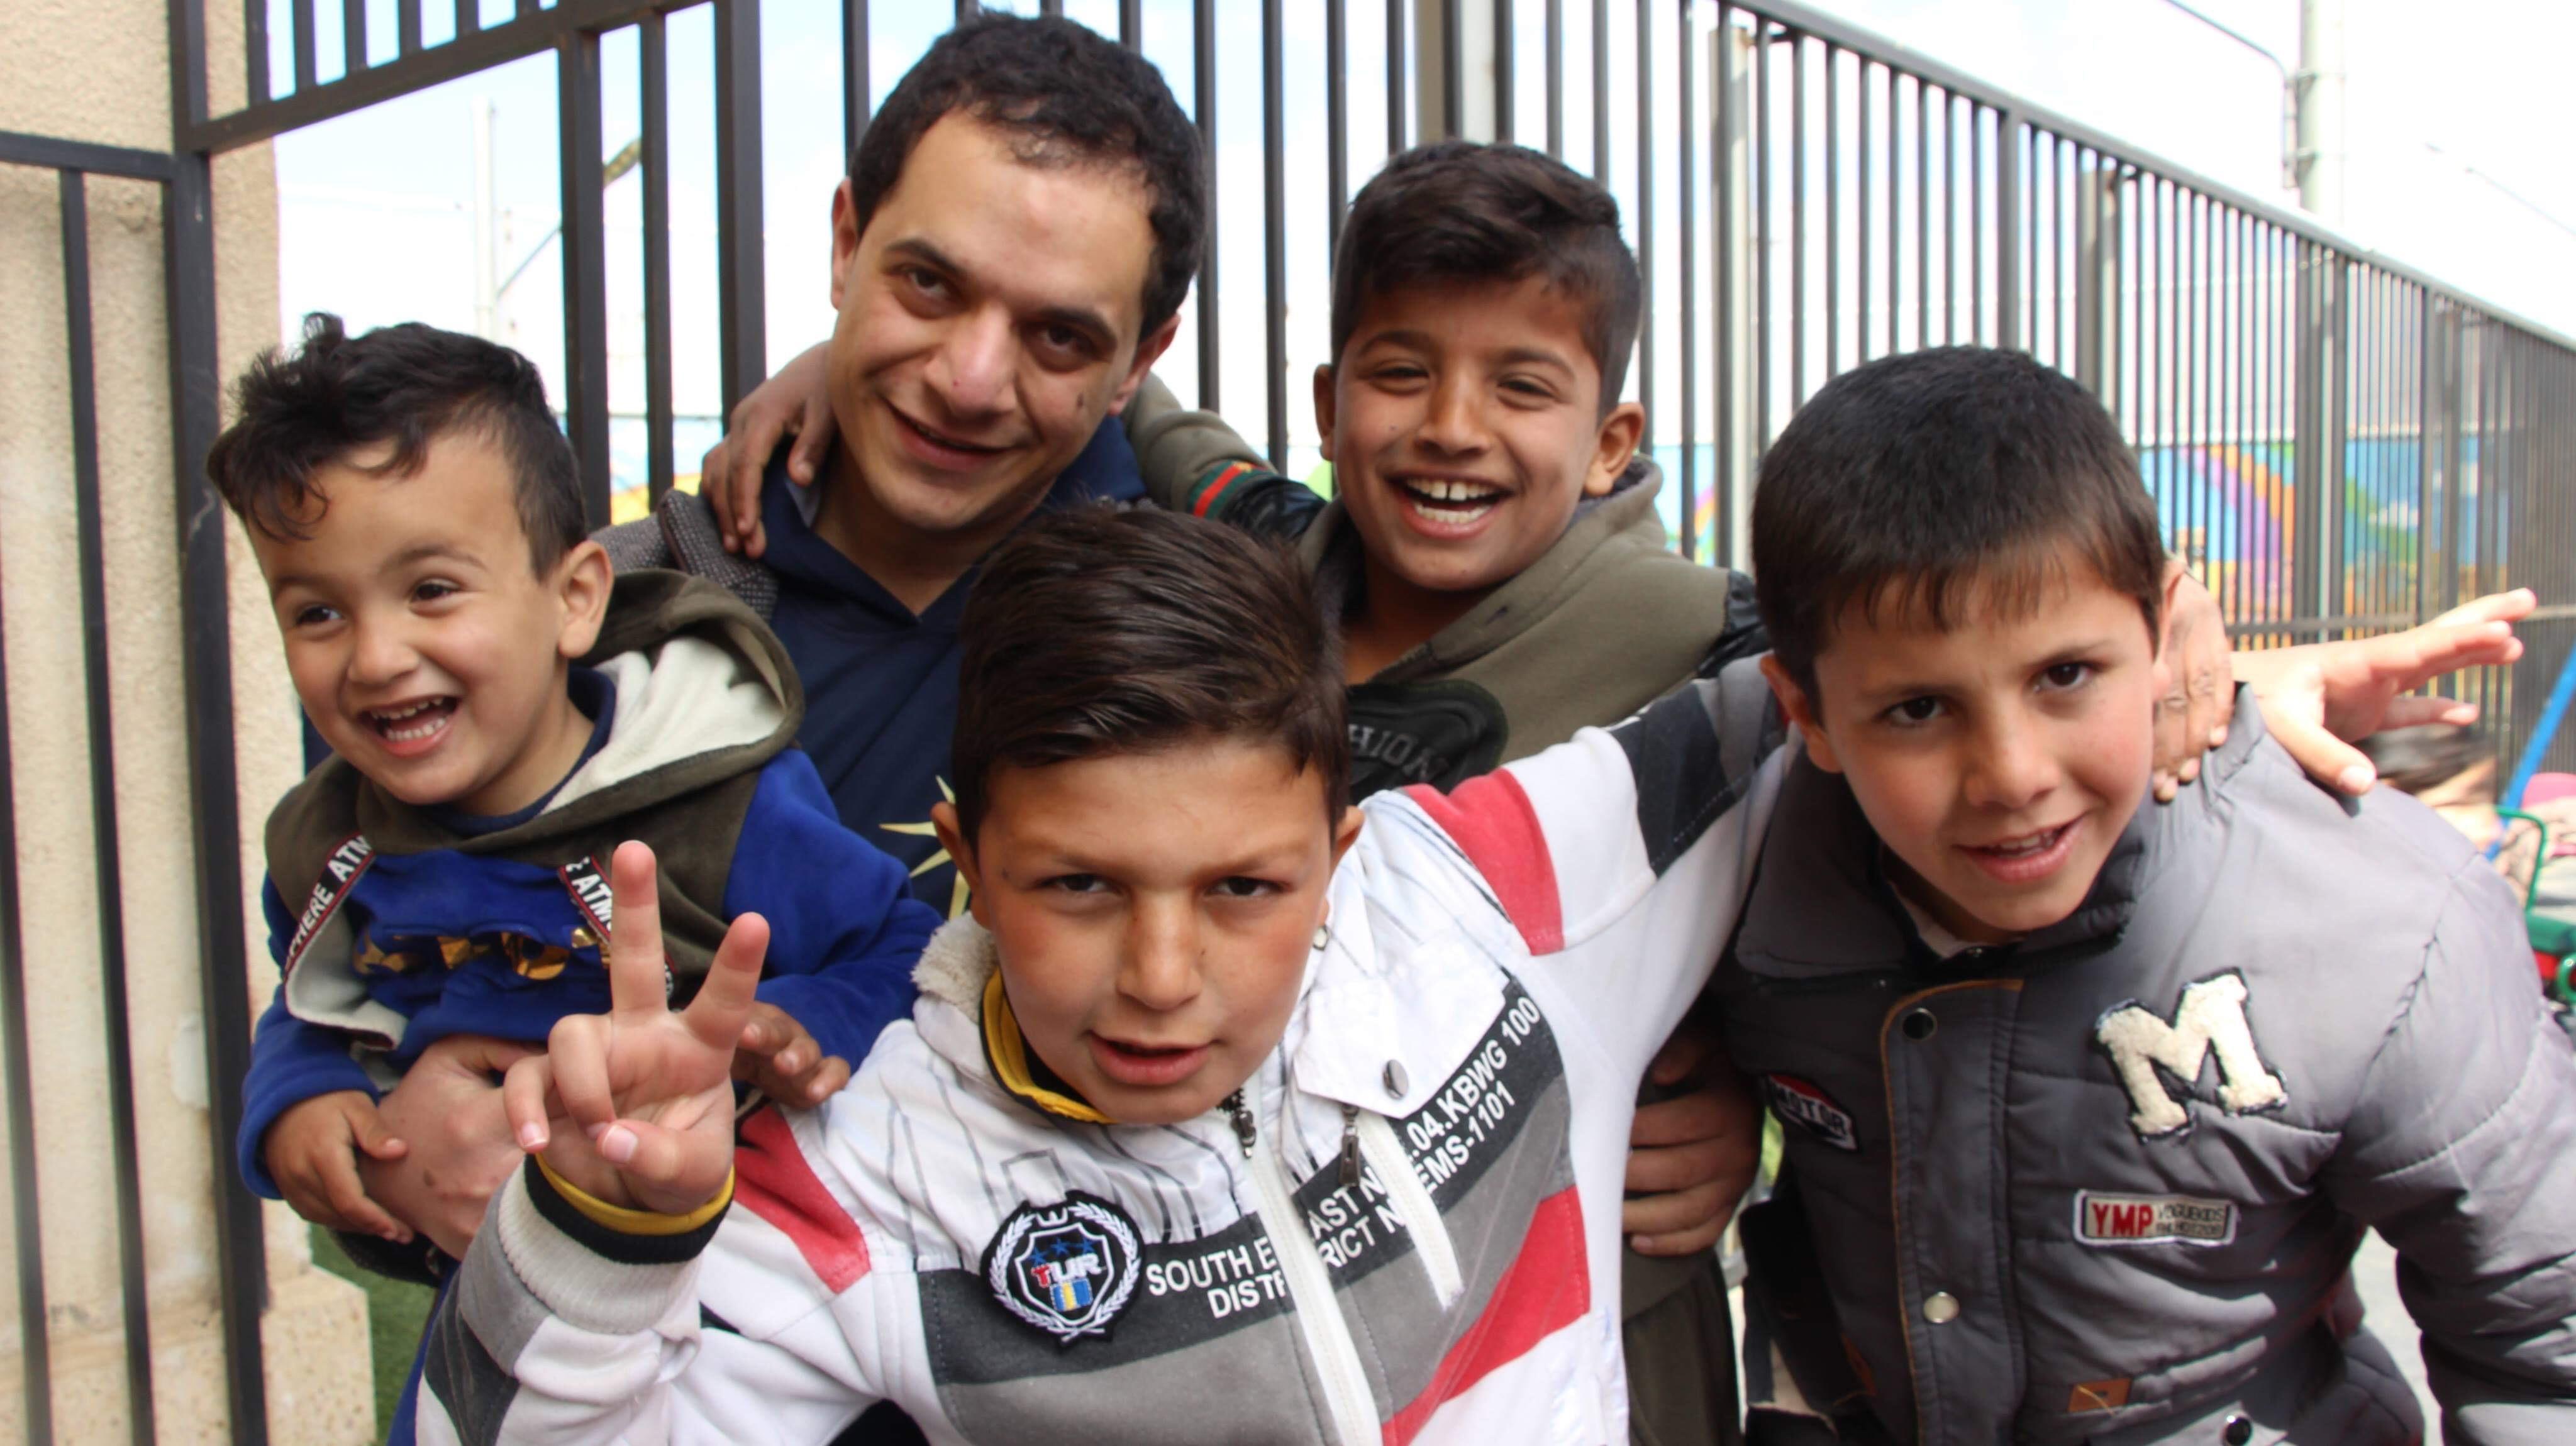 Shepherd Society's 10th Visit to Serve Refugees in Jordan!